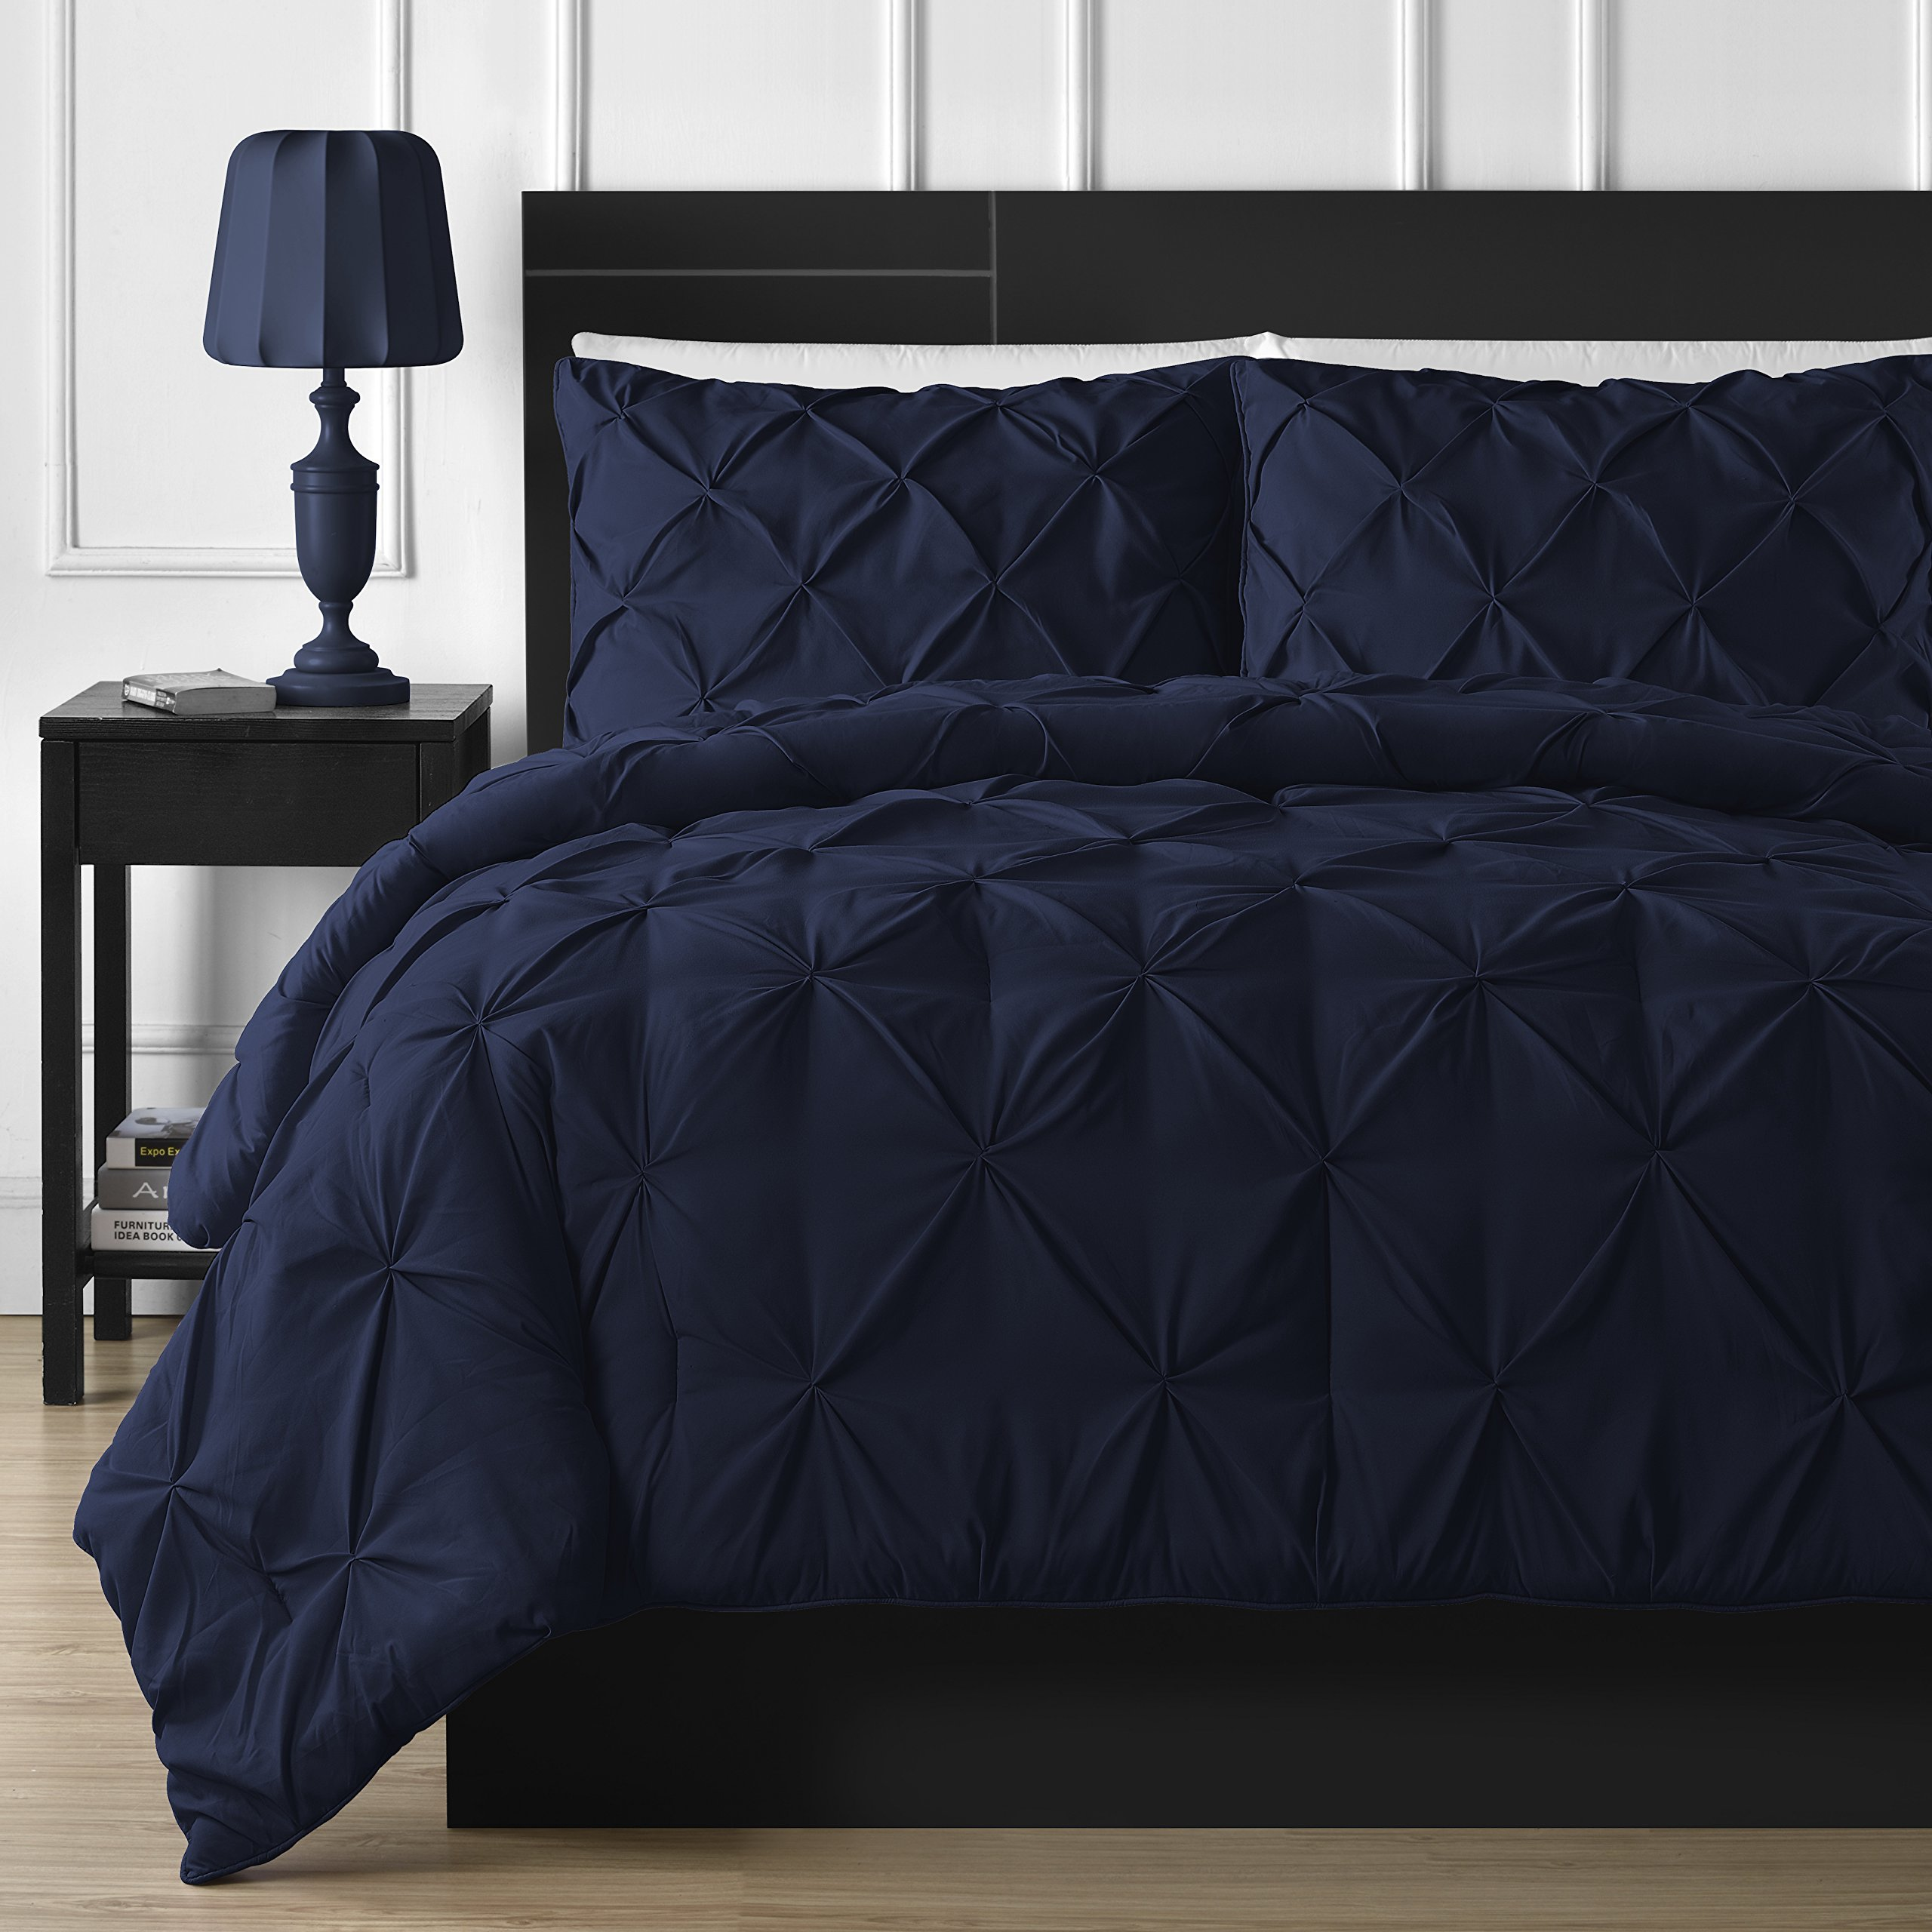 blue thinking king comforter walmart cottage xl ophelia bedding stone magical medallion twin